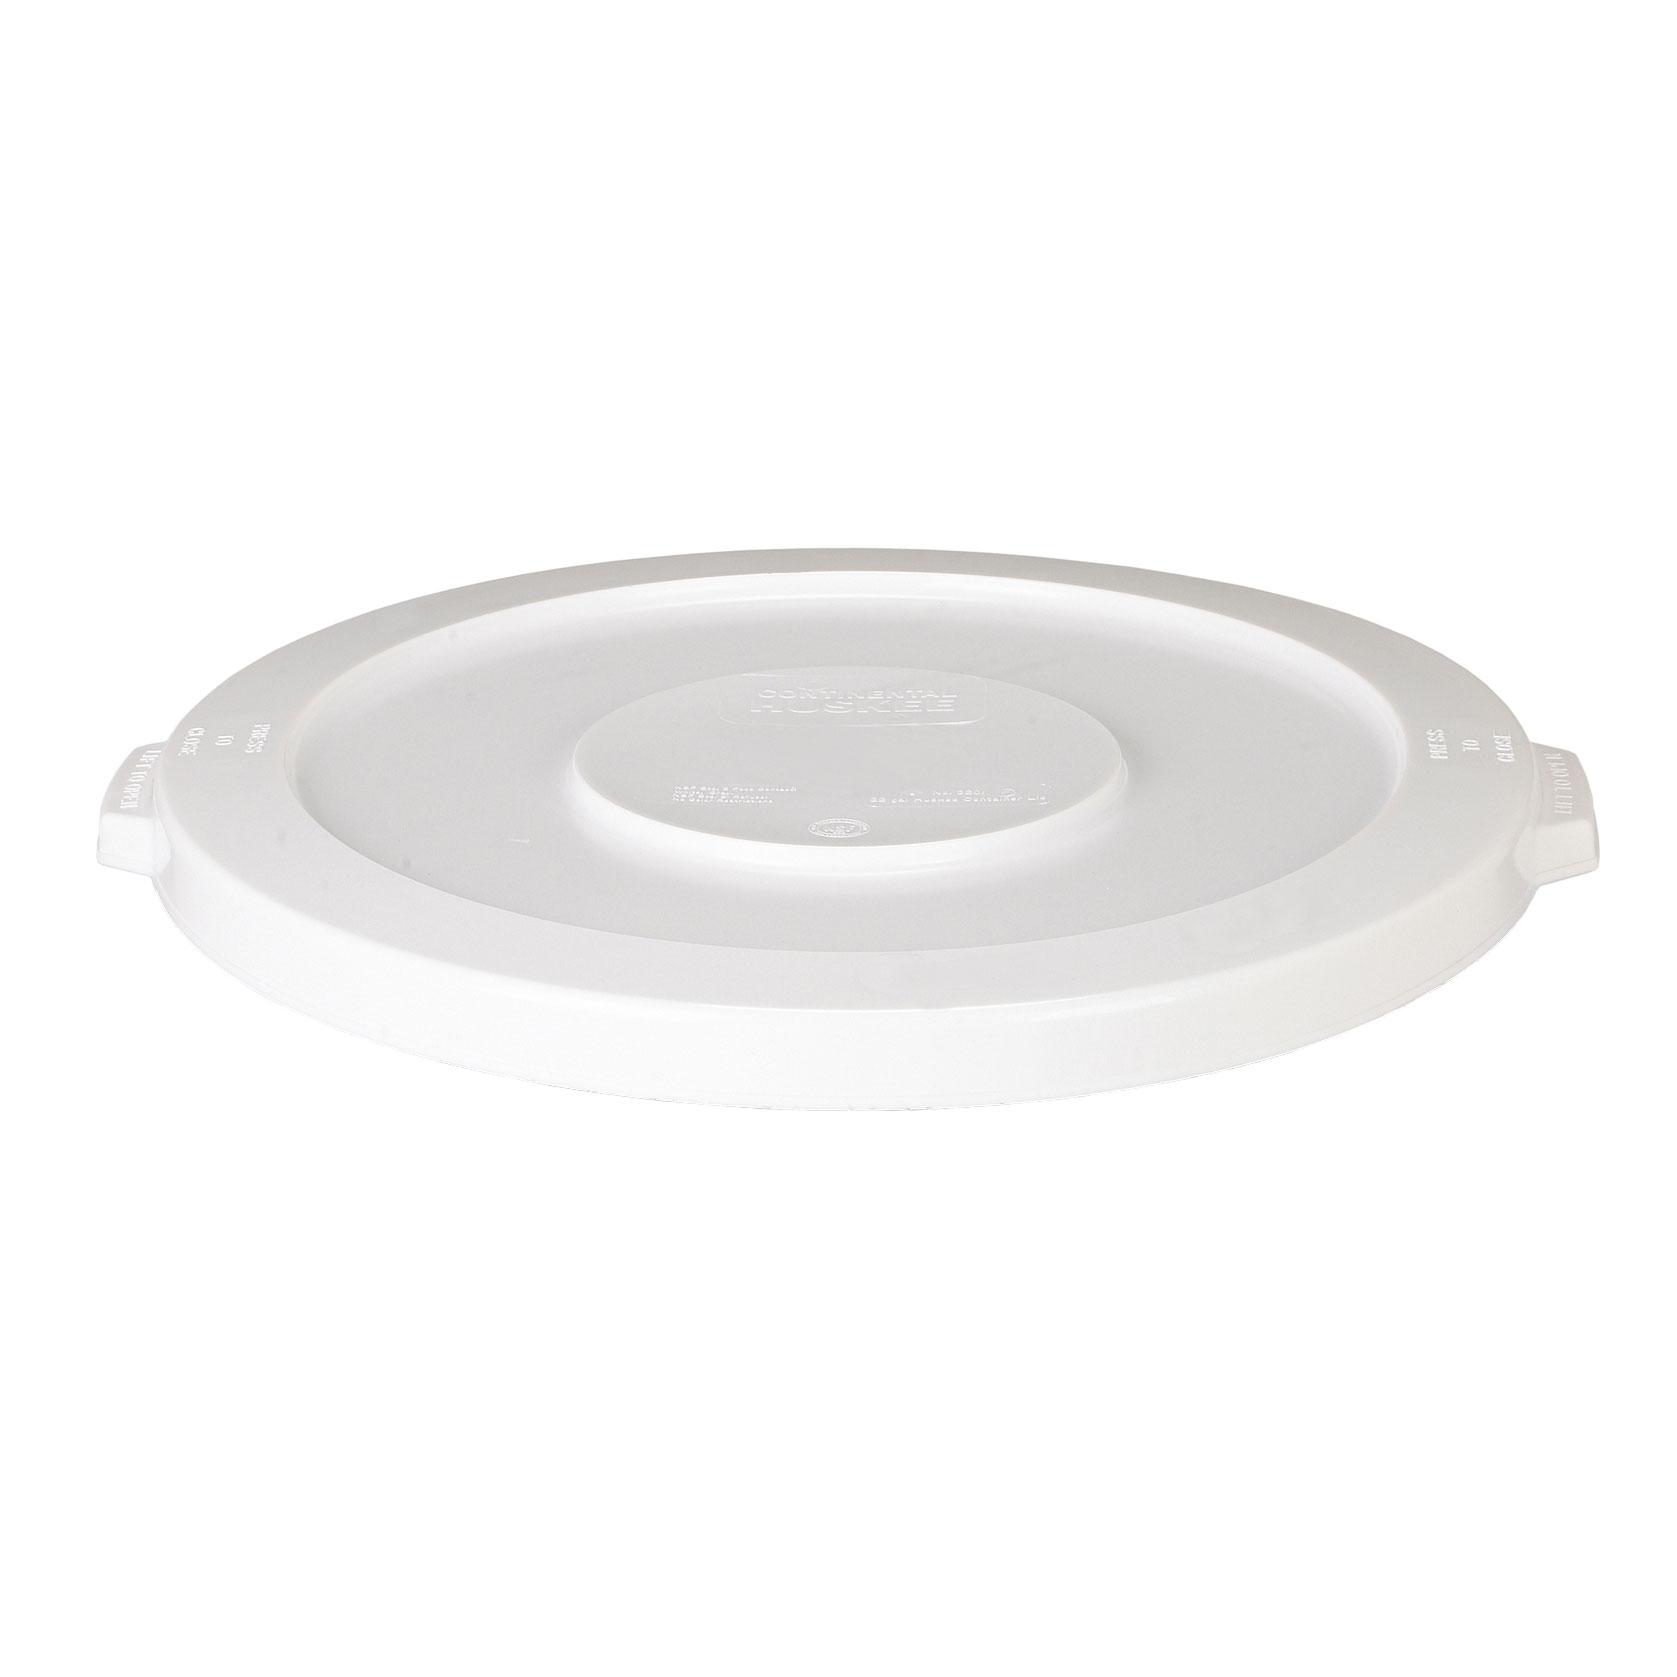 Royal Industries CCP 1002WH trash receptacle lid / top